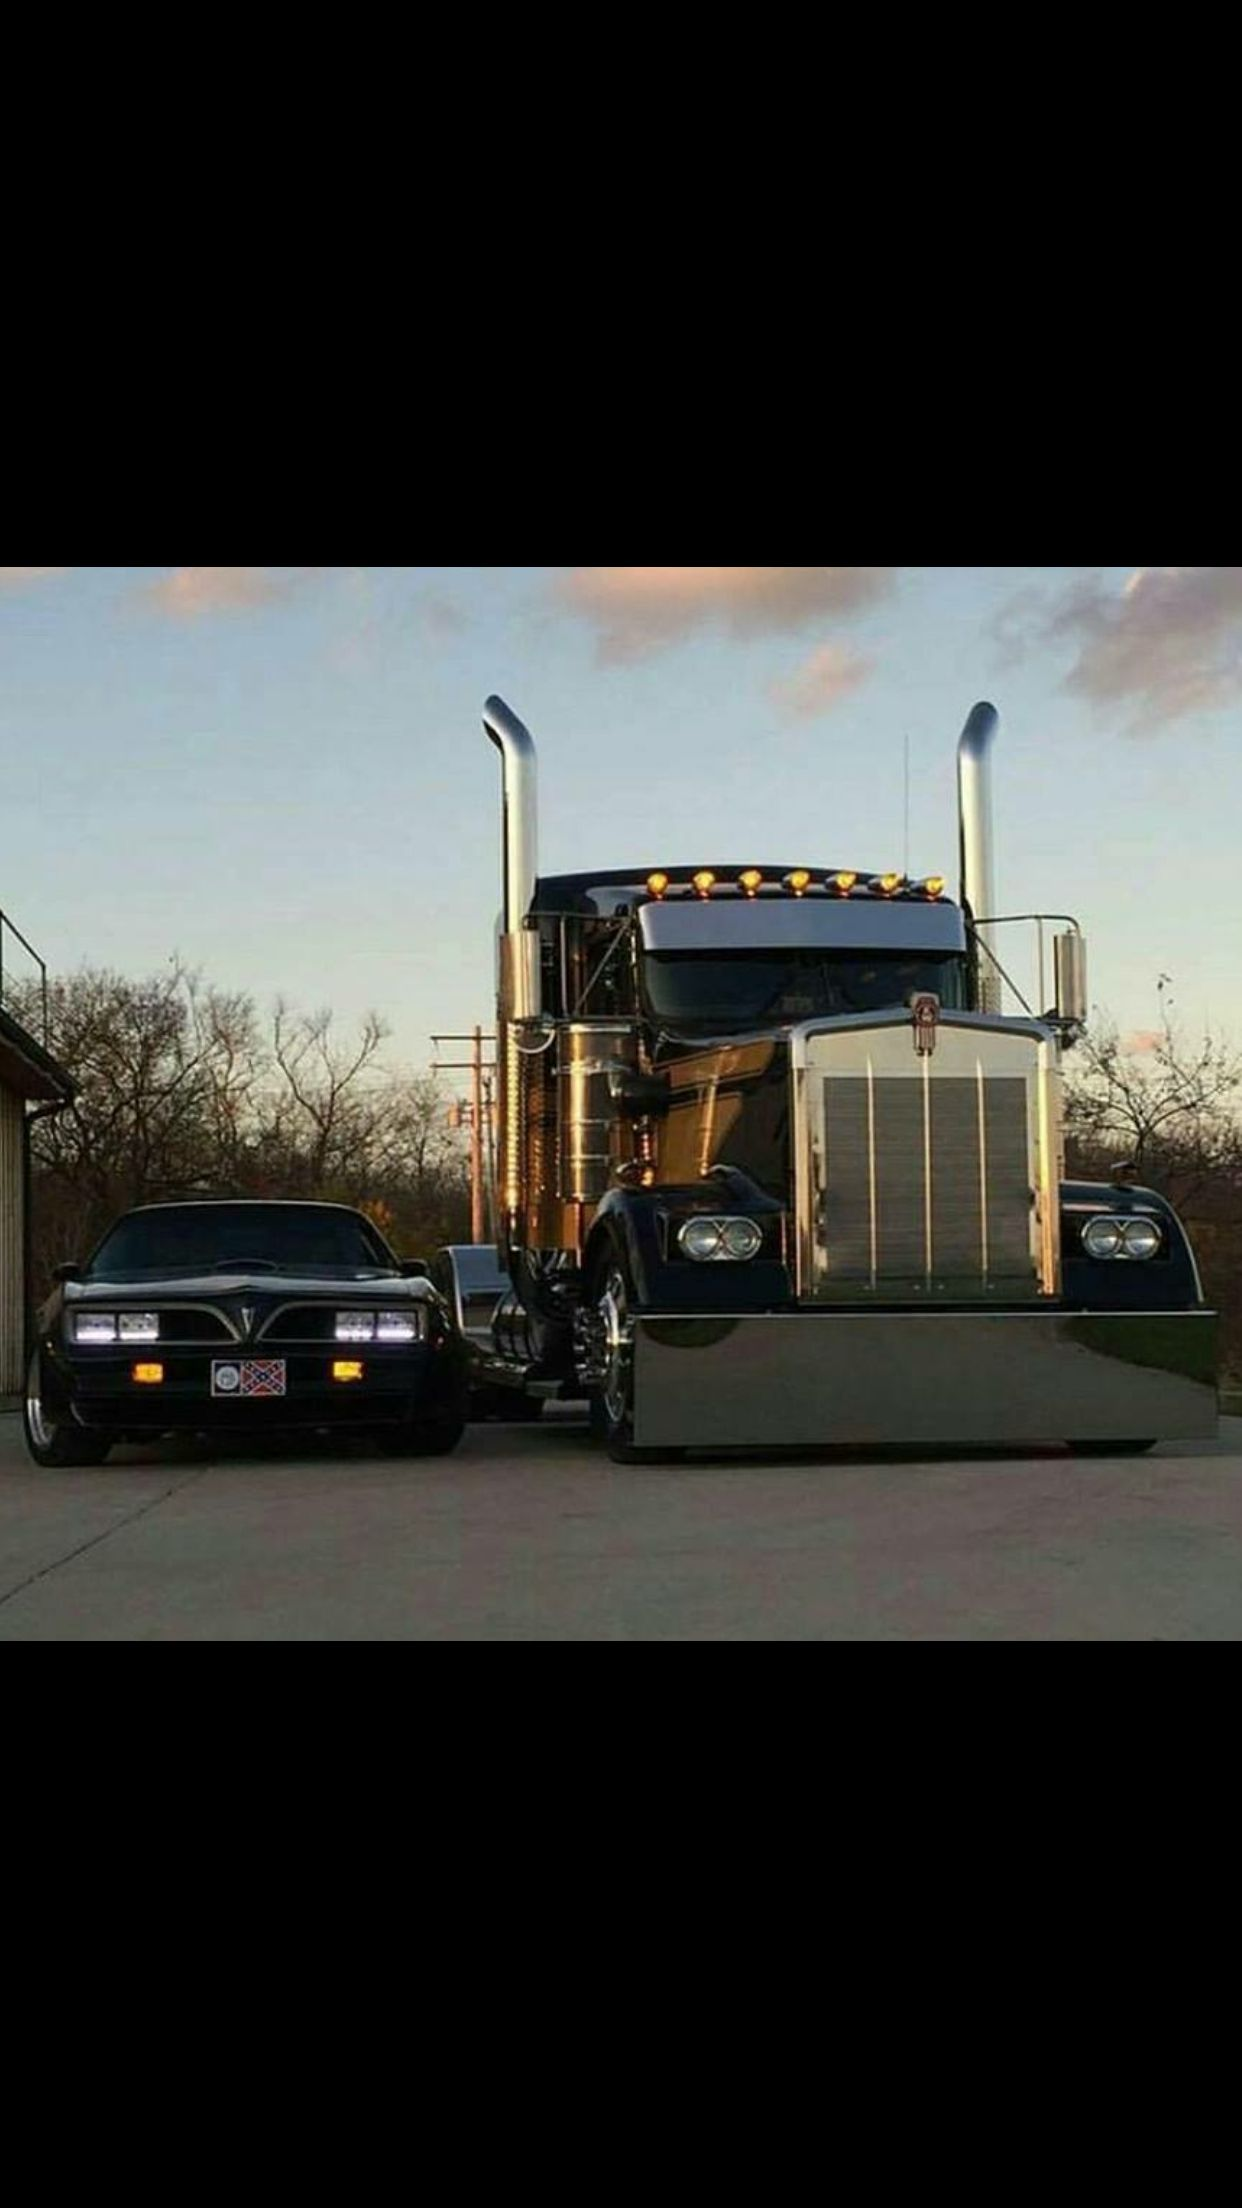 Smokey And The Bandit Kenworth : smokey, bandit, kenworth, Smokey, Bandit, Trucks,, Kenworth, Trucks